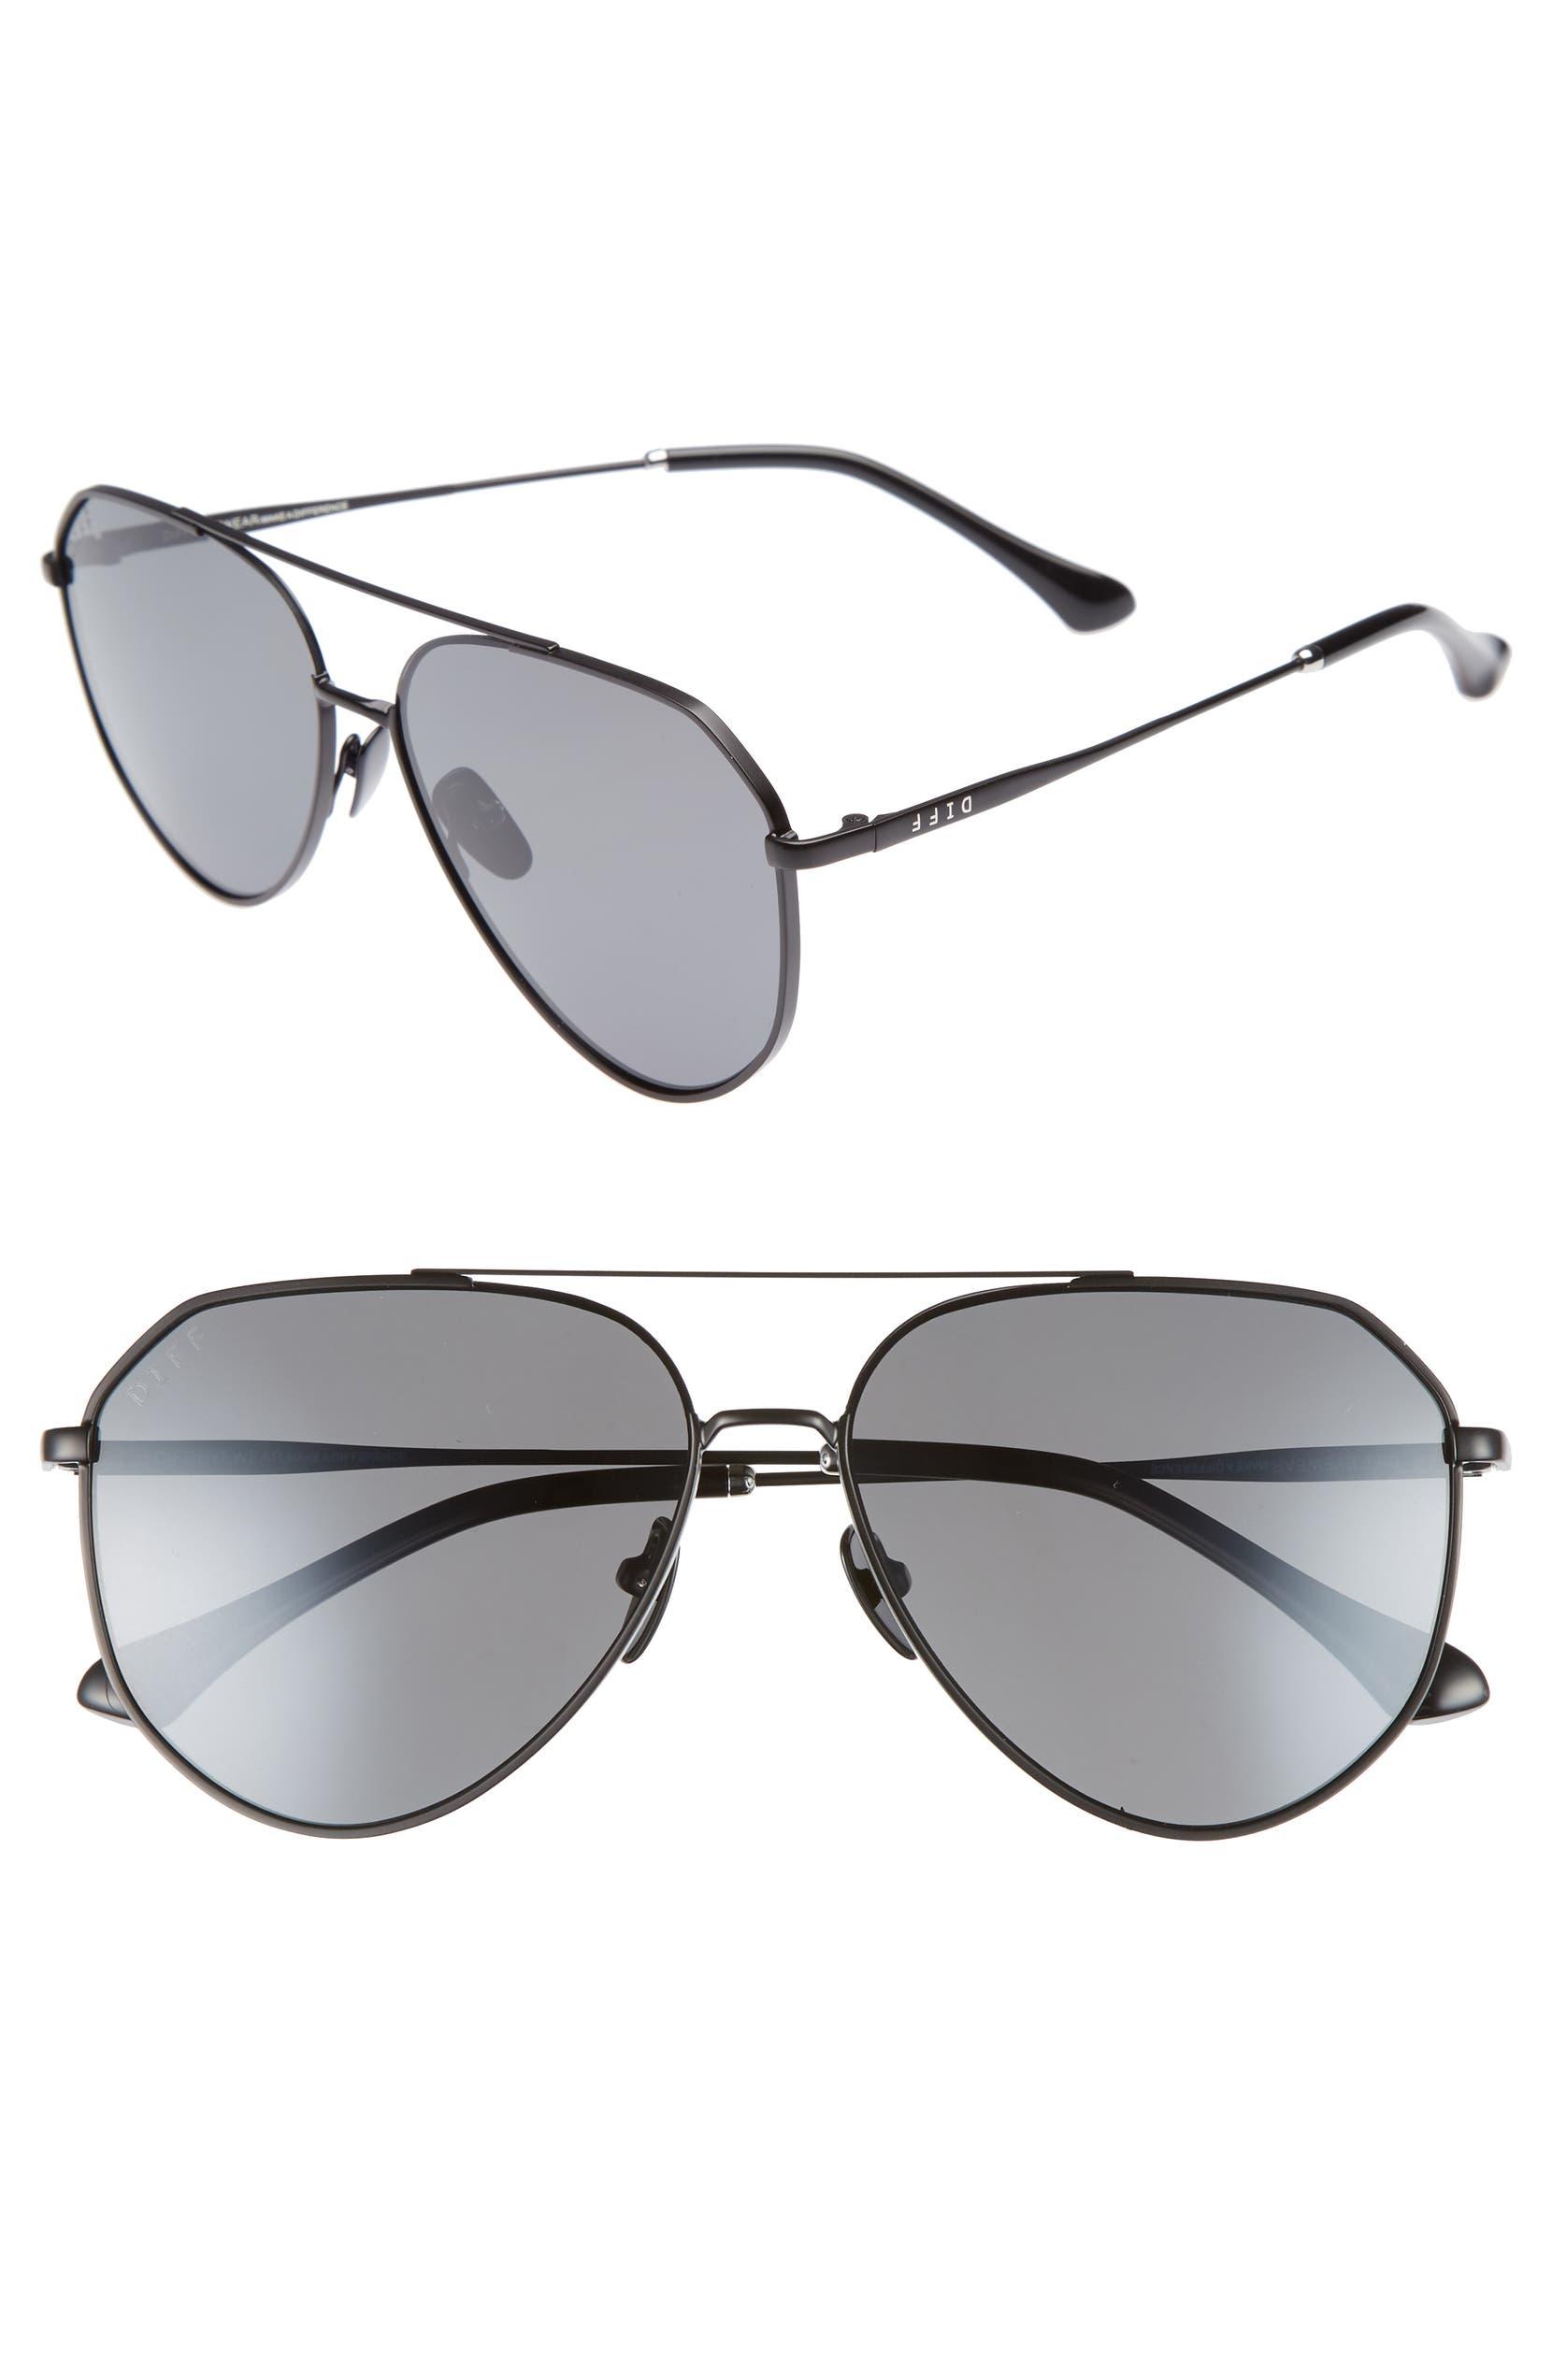 6d24681b645ca DIFF Dash 58mm Aviator Sunglasses